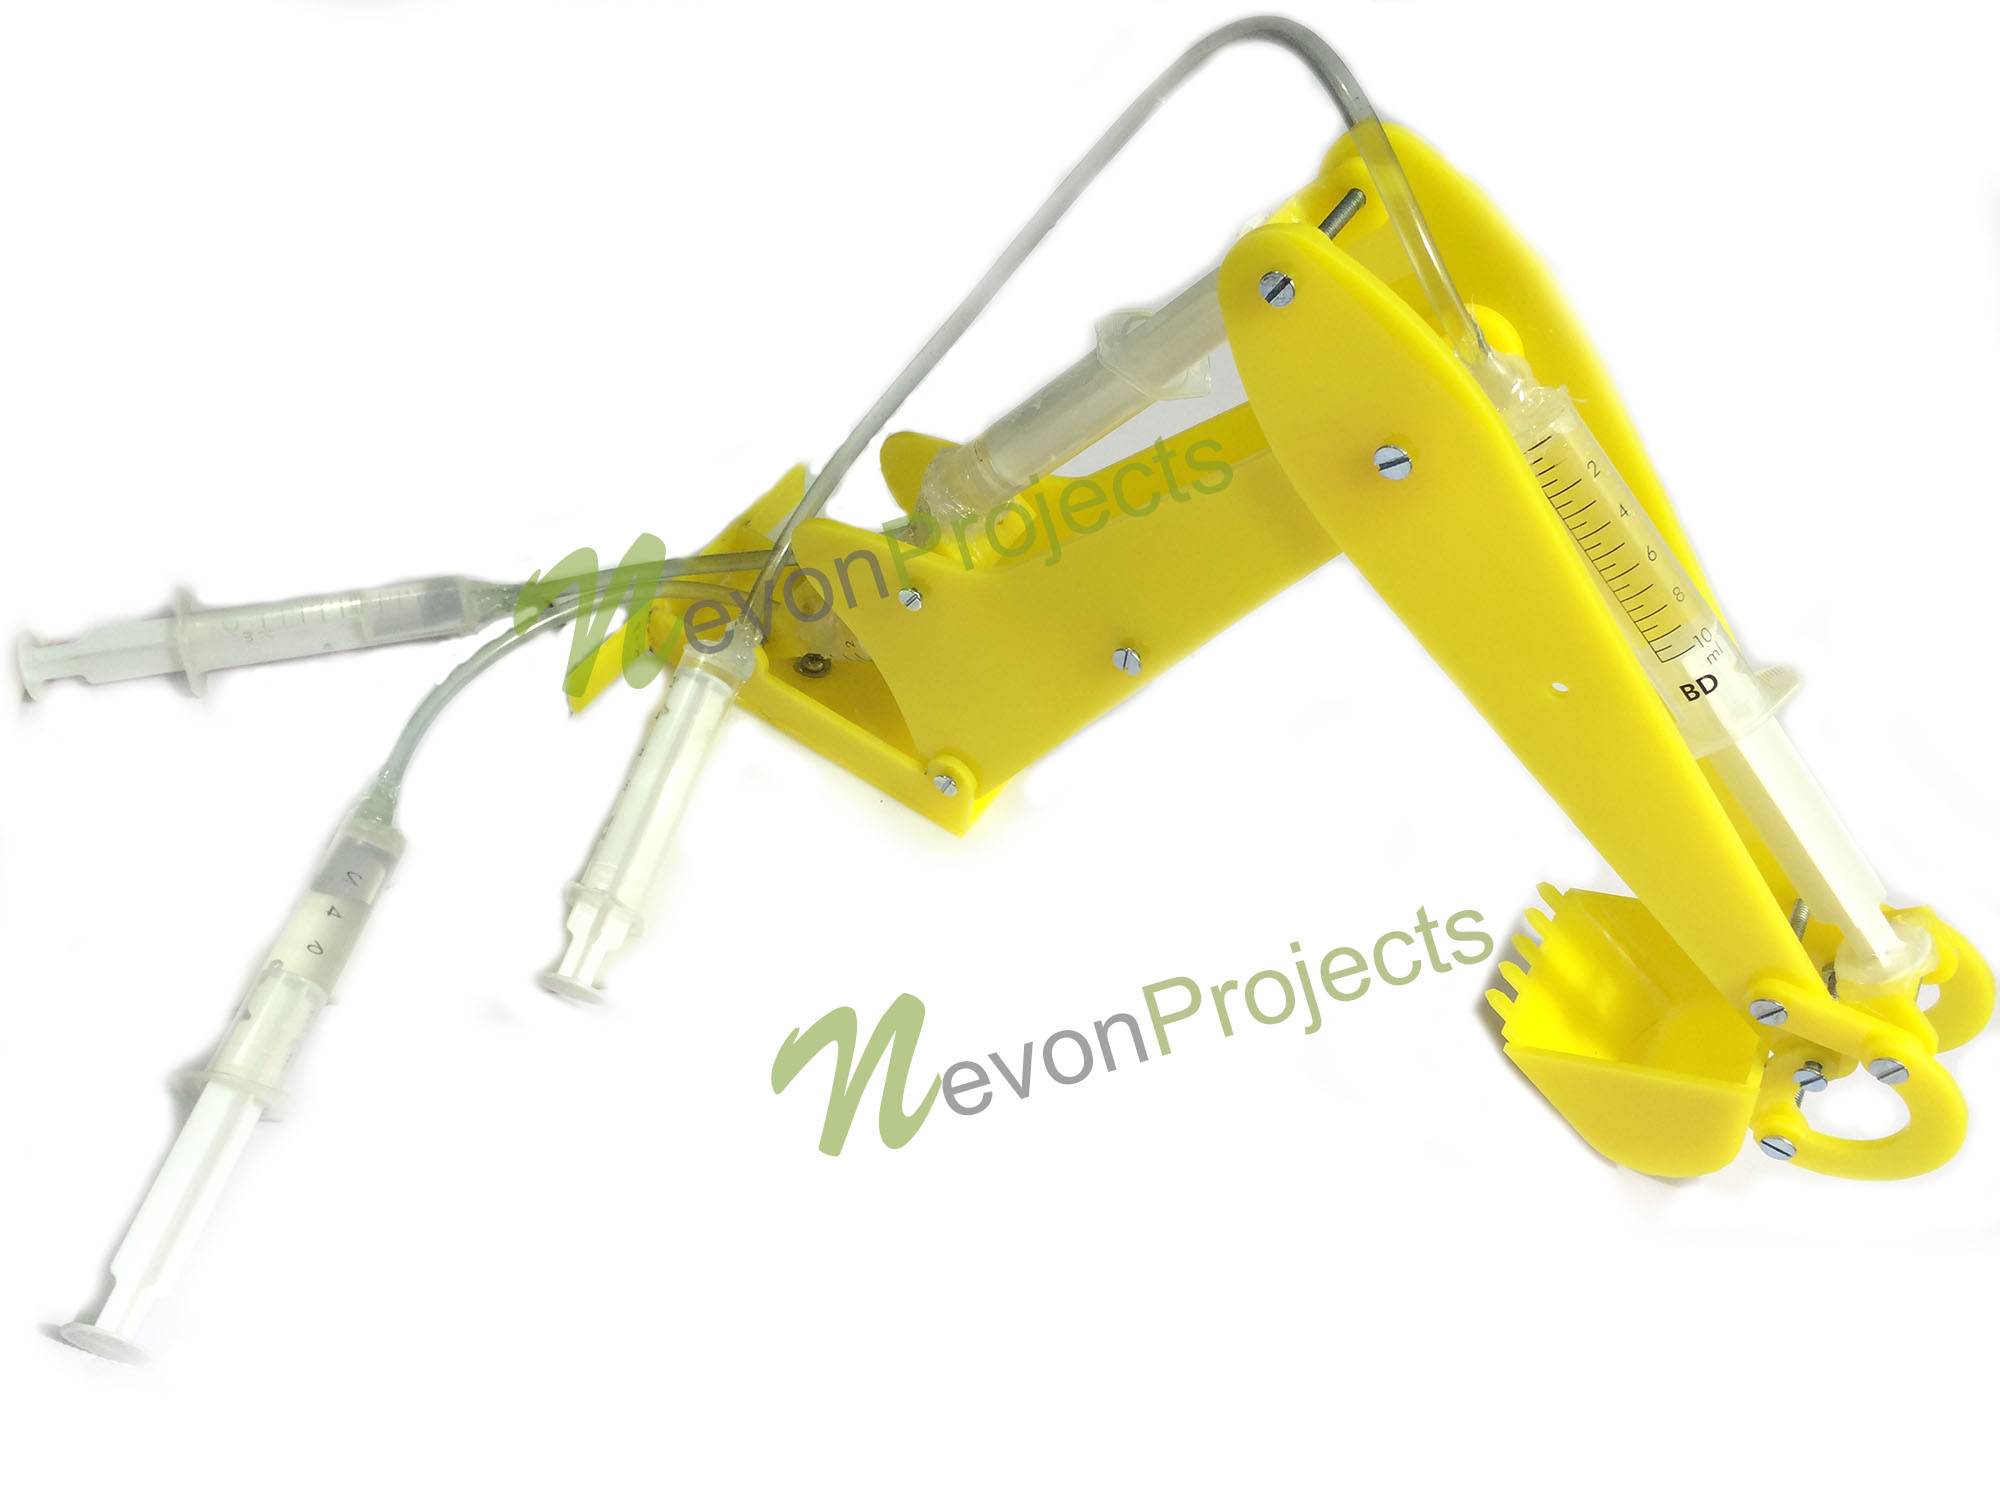 3 DOF Hydraulic Extractor Mini JCB Project | NevonProjects